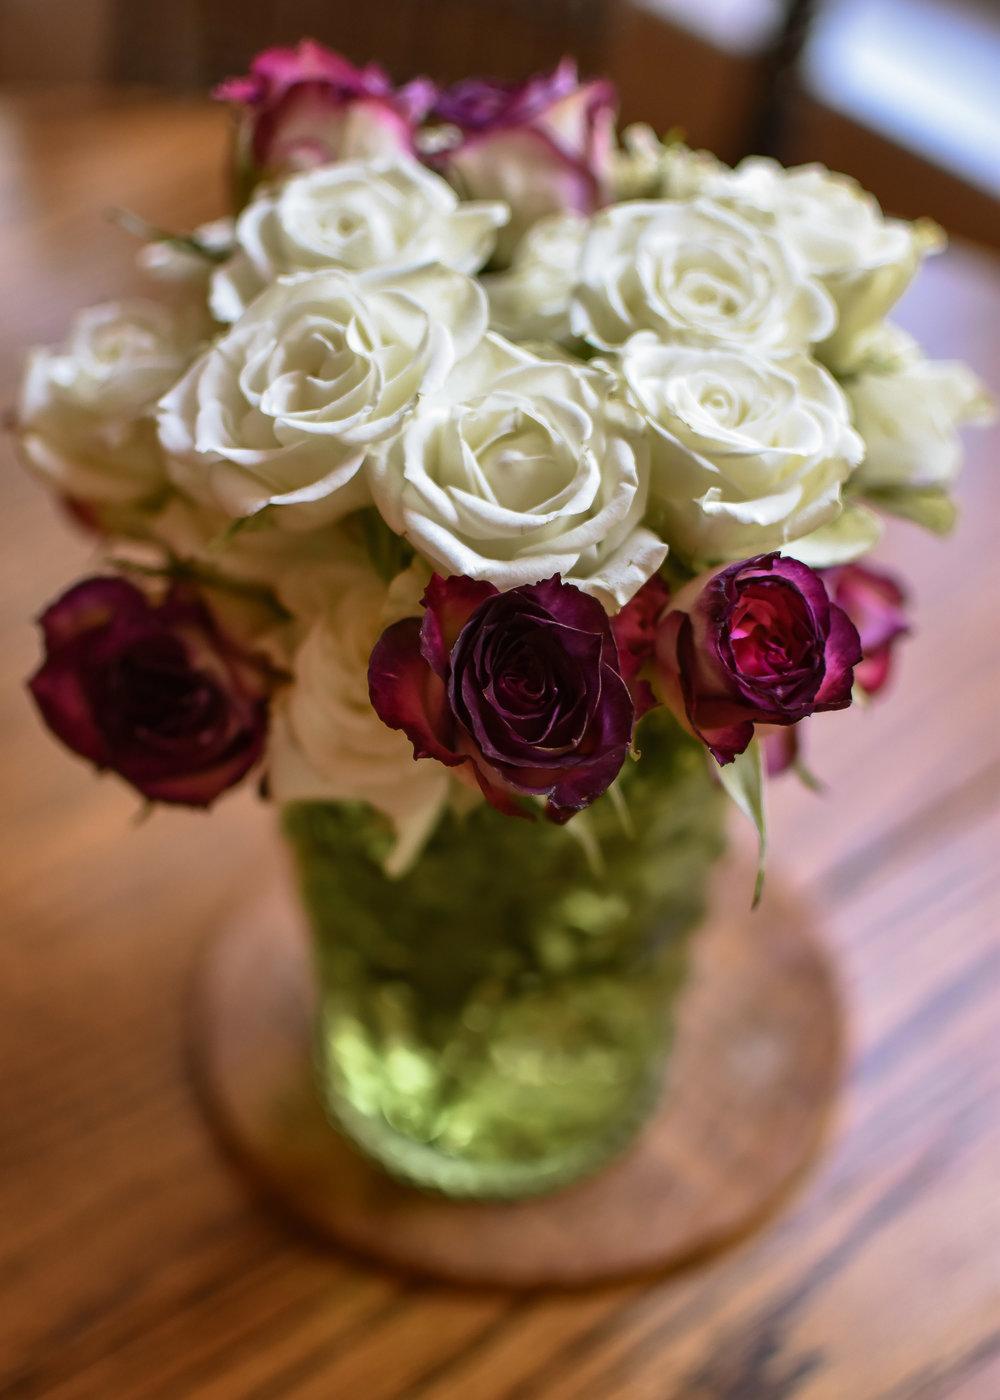 Live Your Inner Power Roses